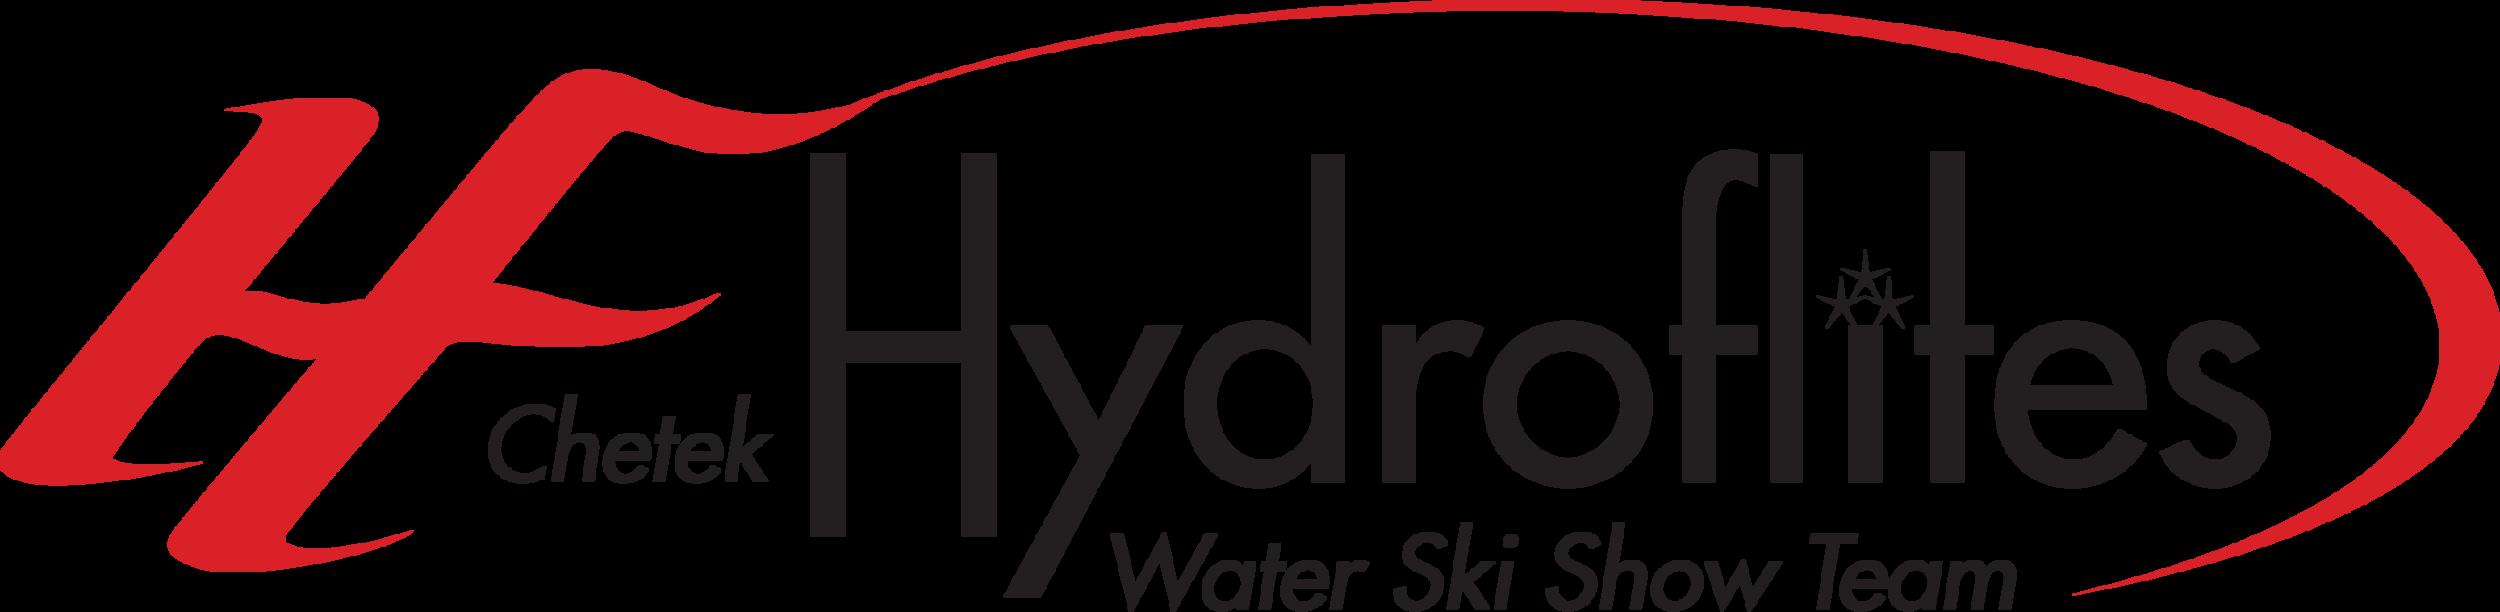 Hydroflites_full_logo_red.png